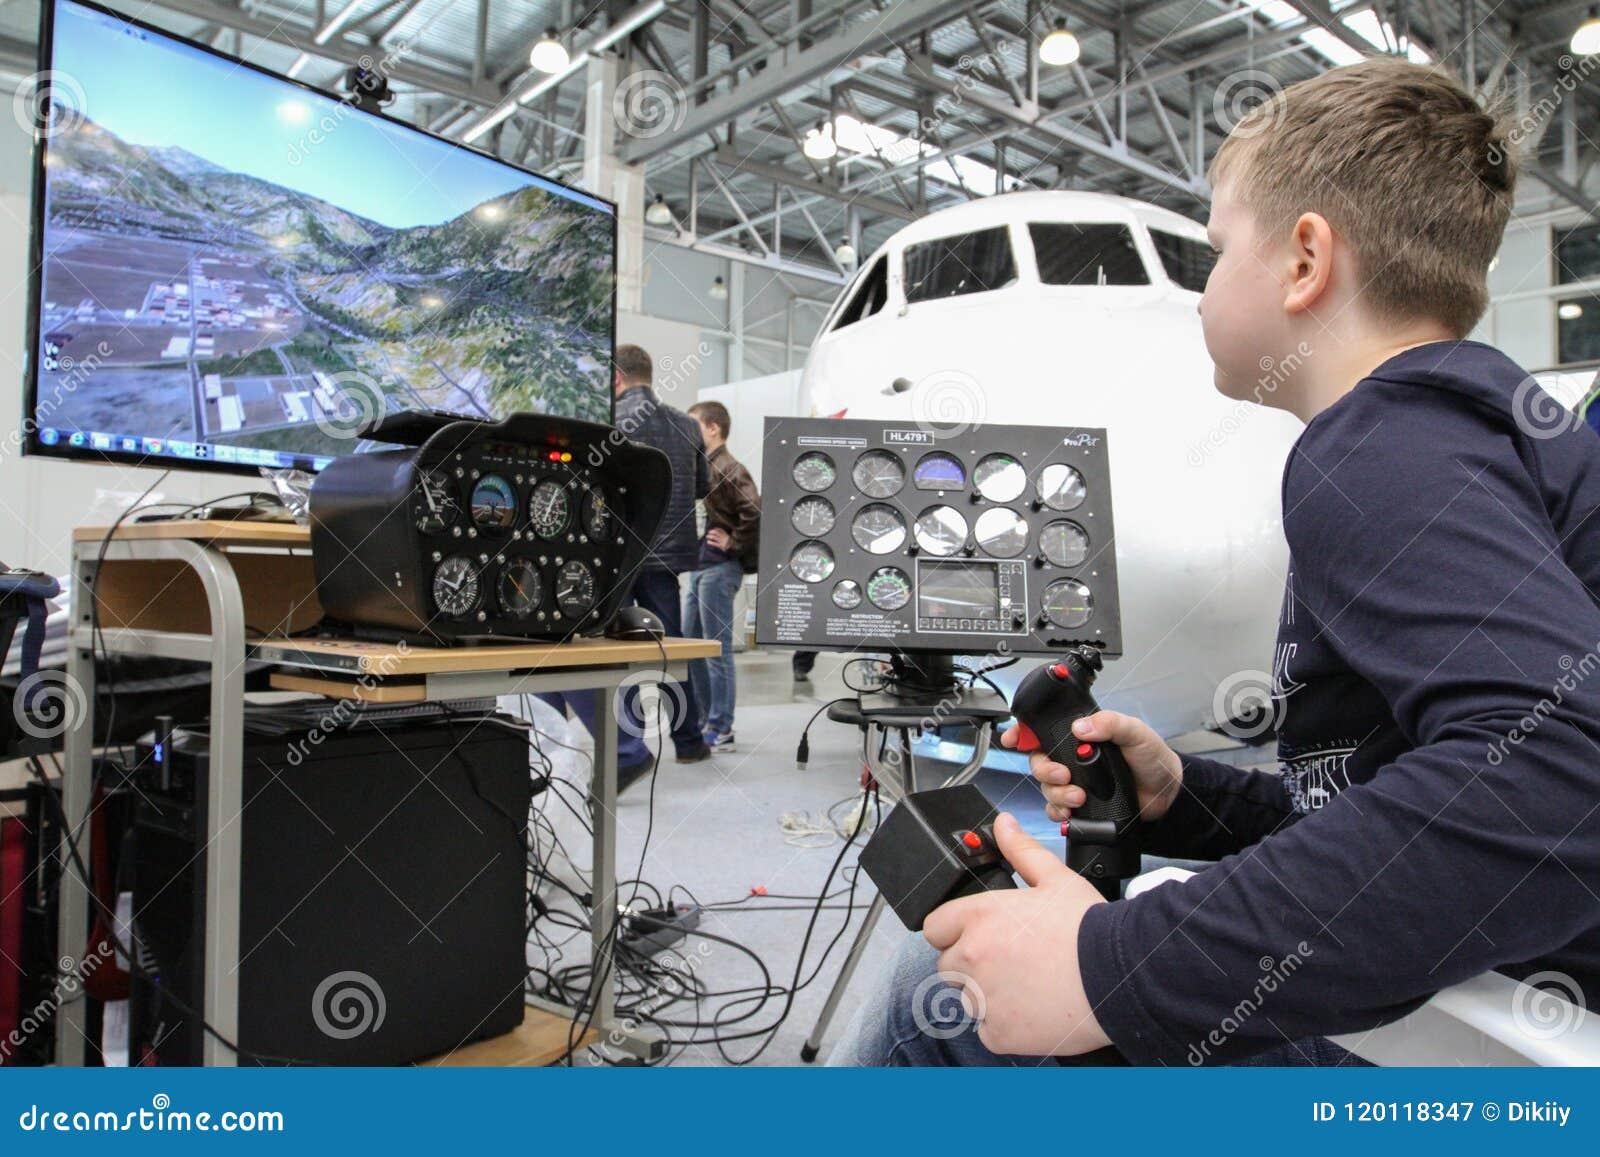 Training On The Flight Simulator Editorial Photography